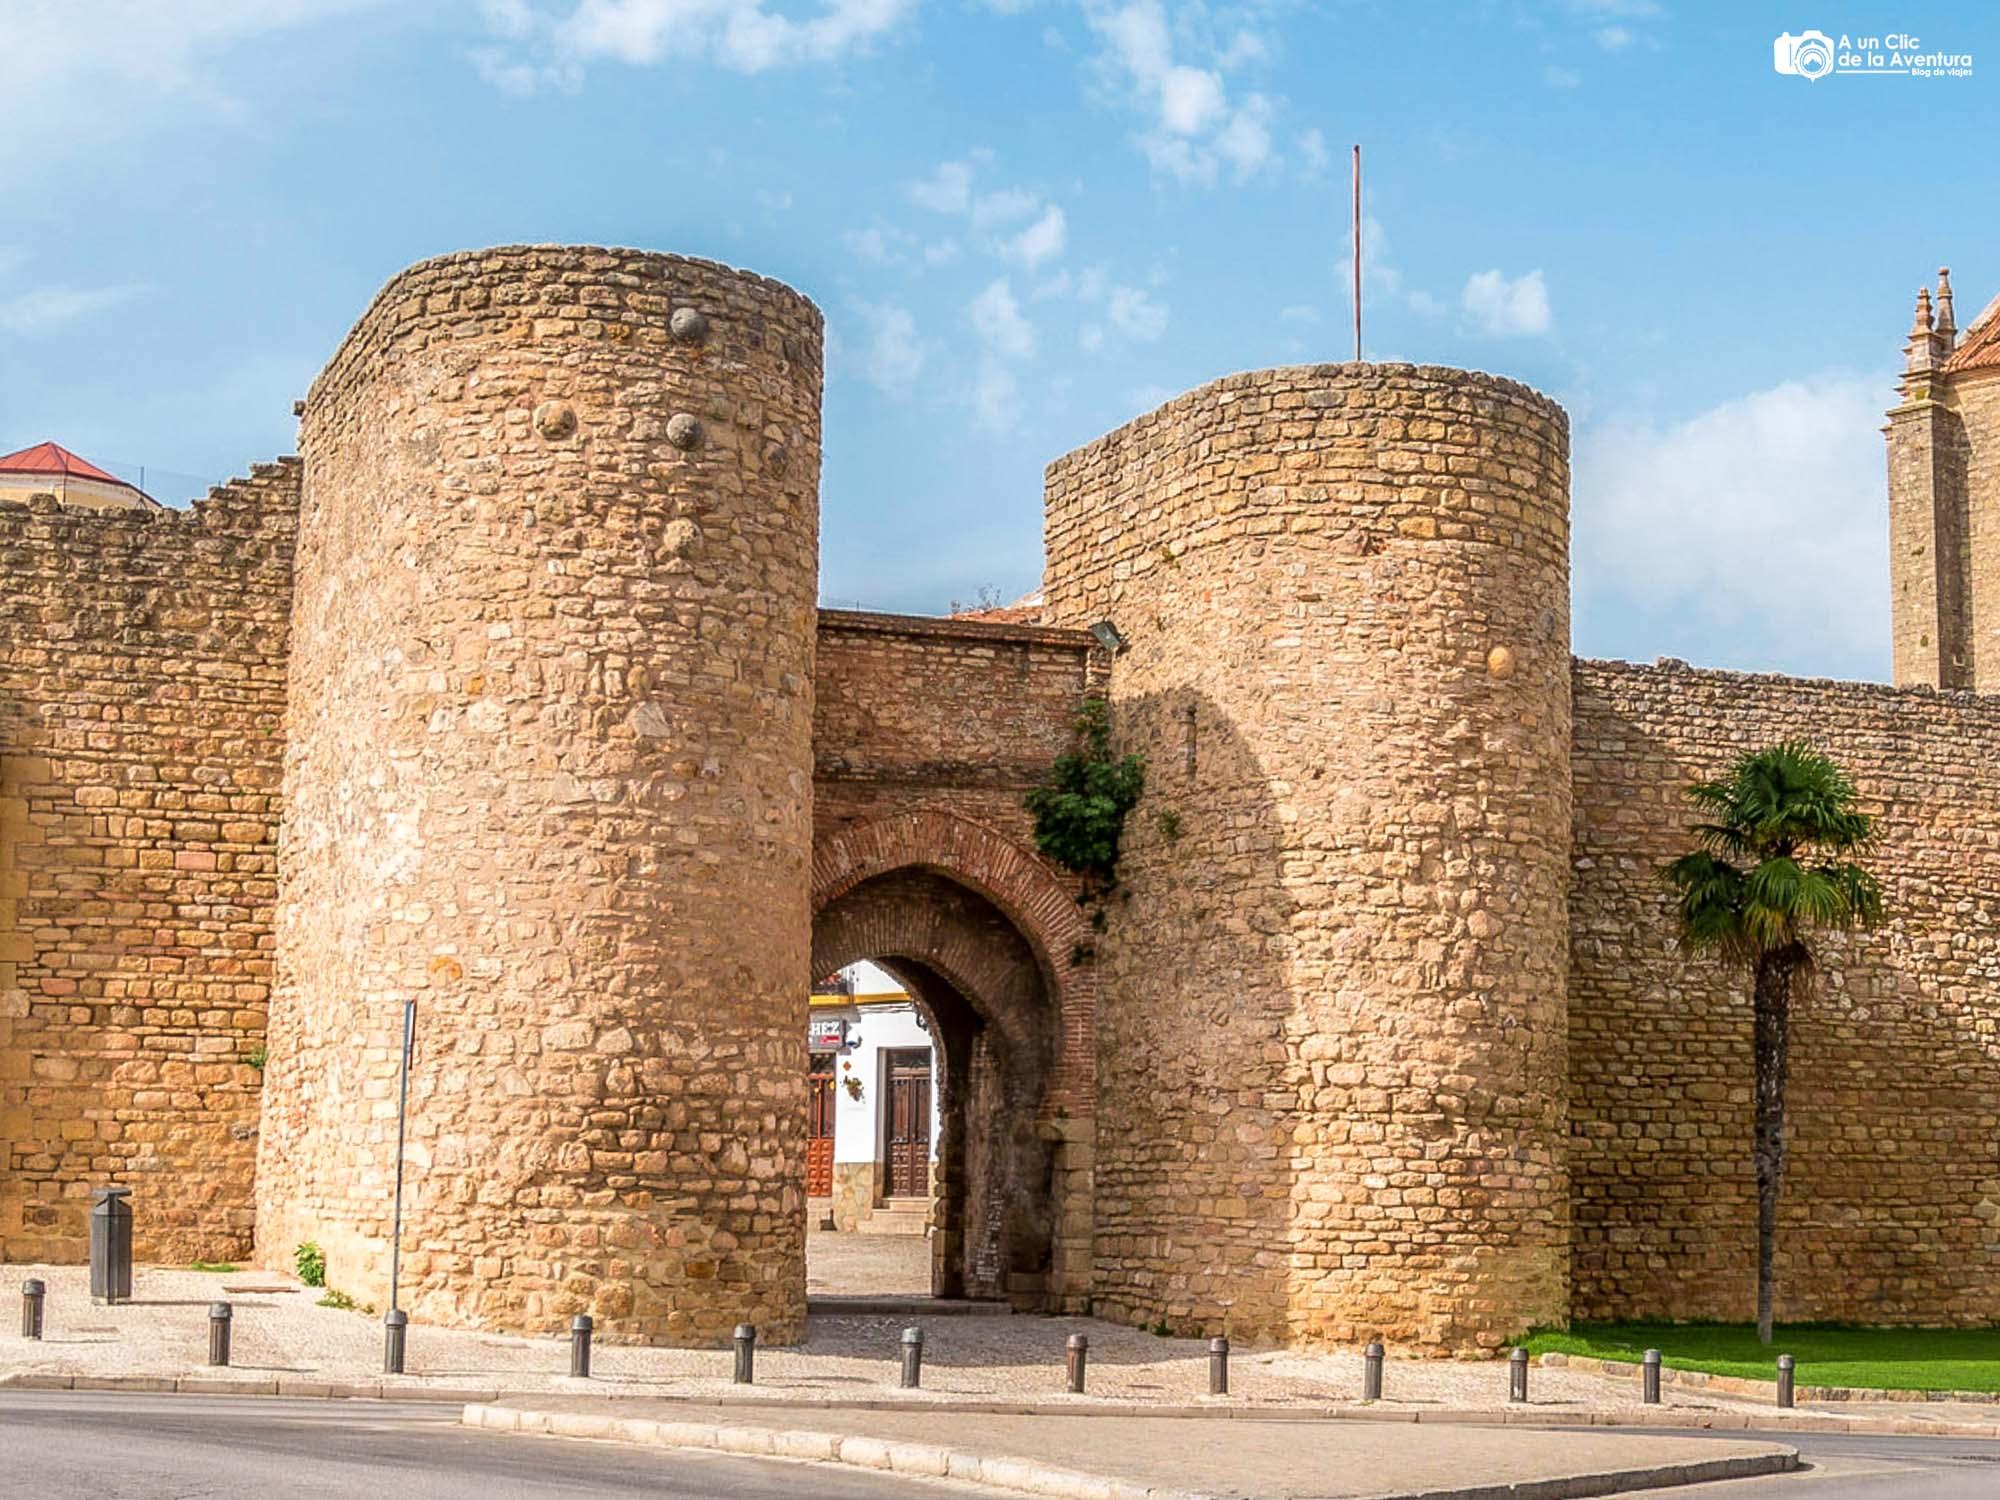 Puerta de Almocábar de Ronda